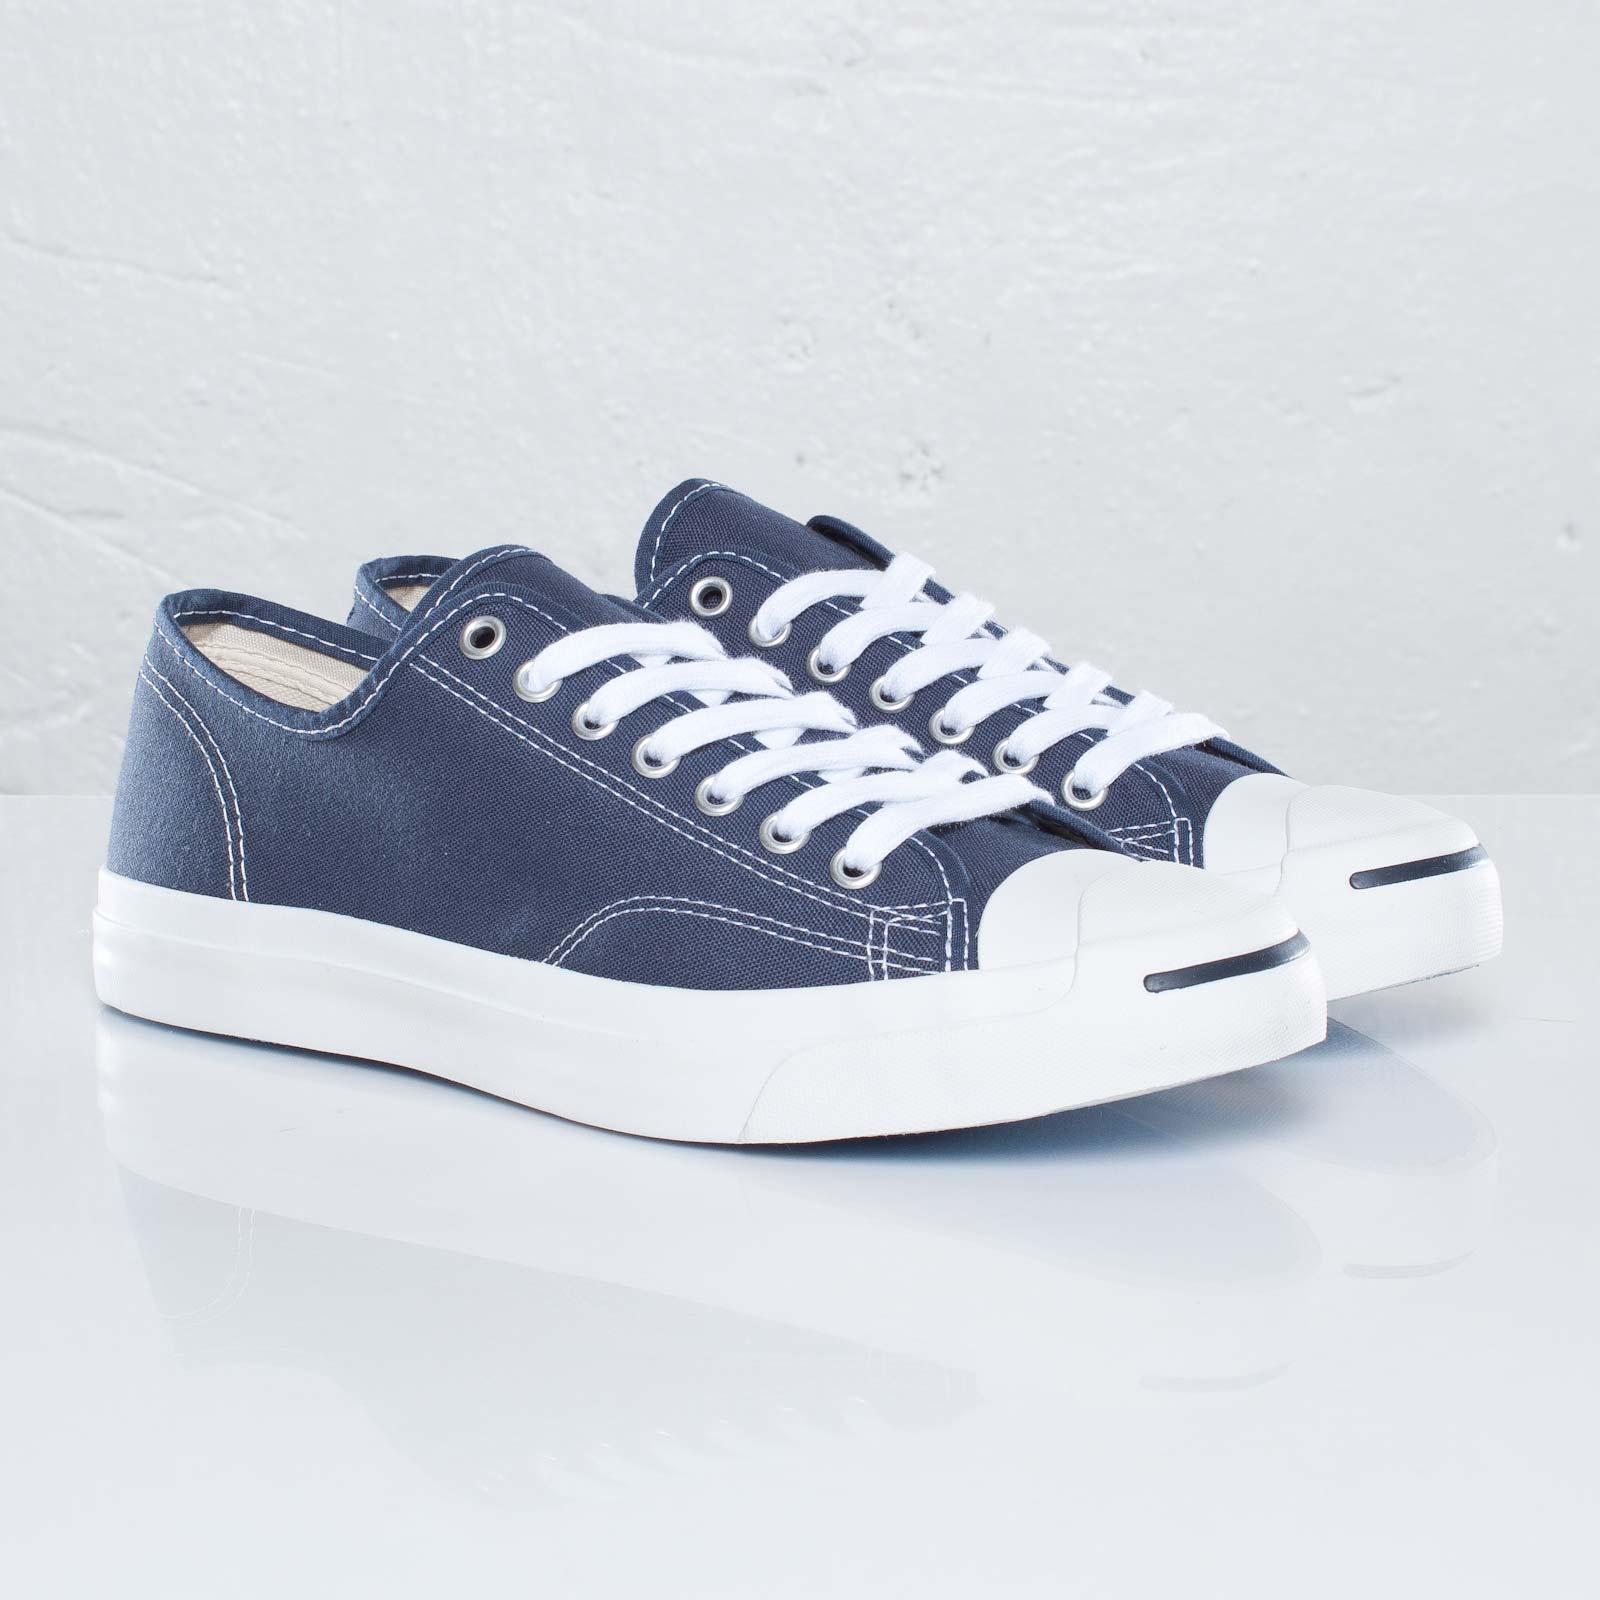 eab385de206b Converse Jack Purcell CP Ox - 110158 - Sneakersnstuff